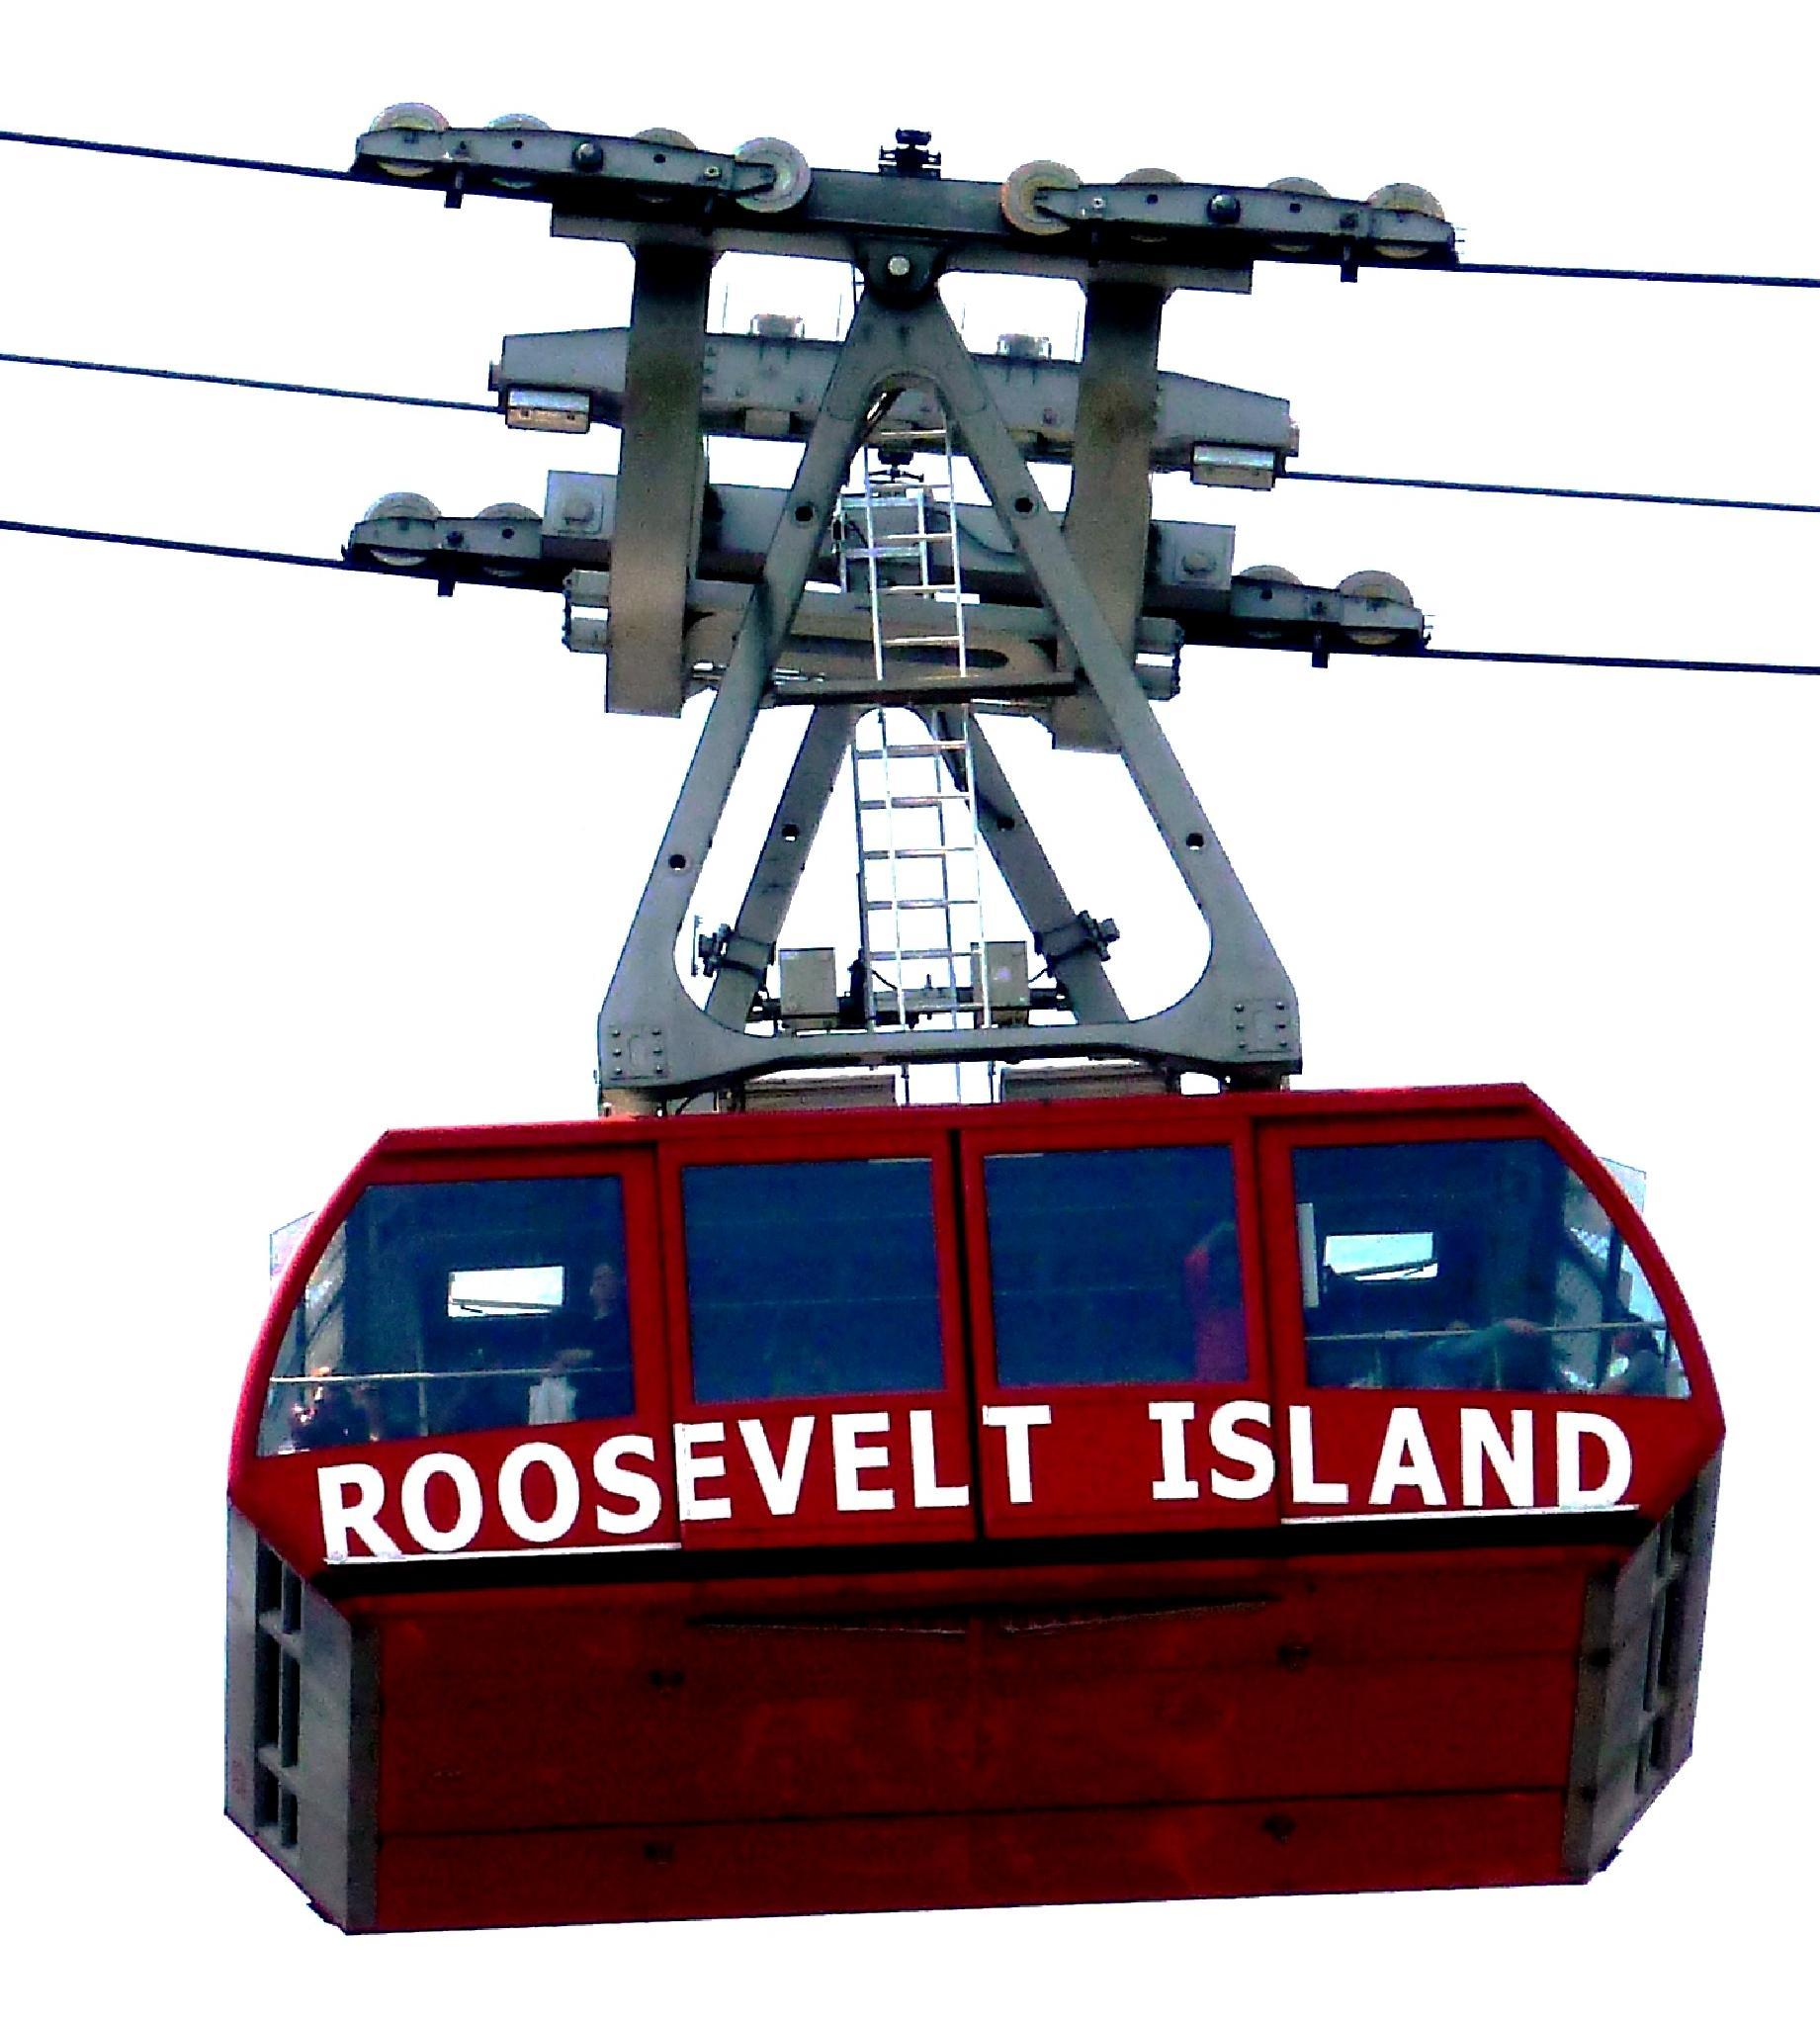 Roosevelt Island Tramway, NYC by Anton Agalbato